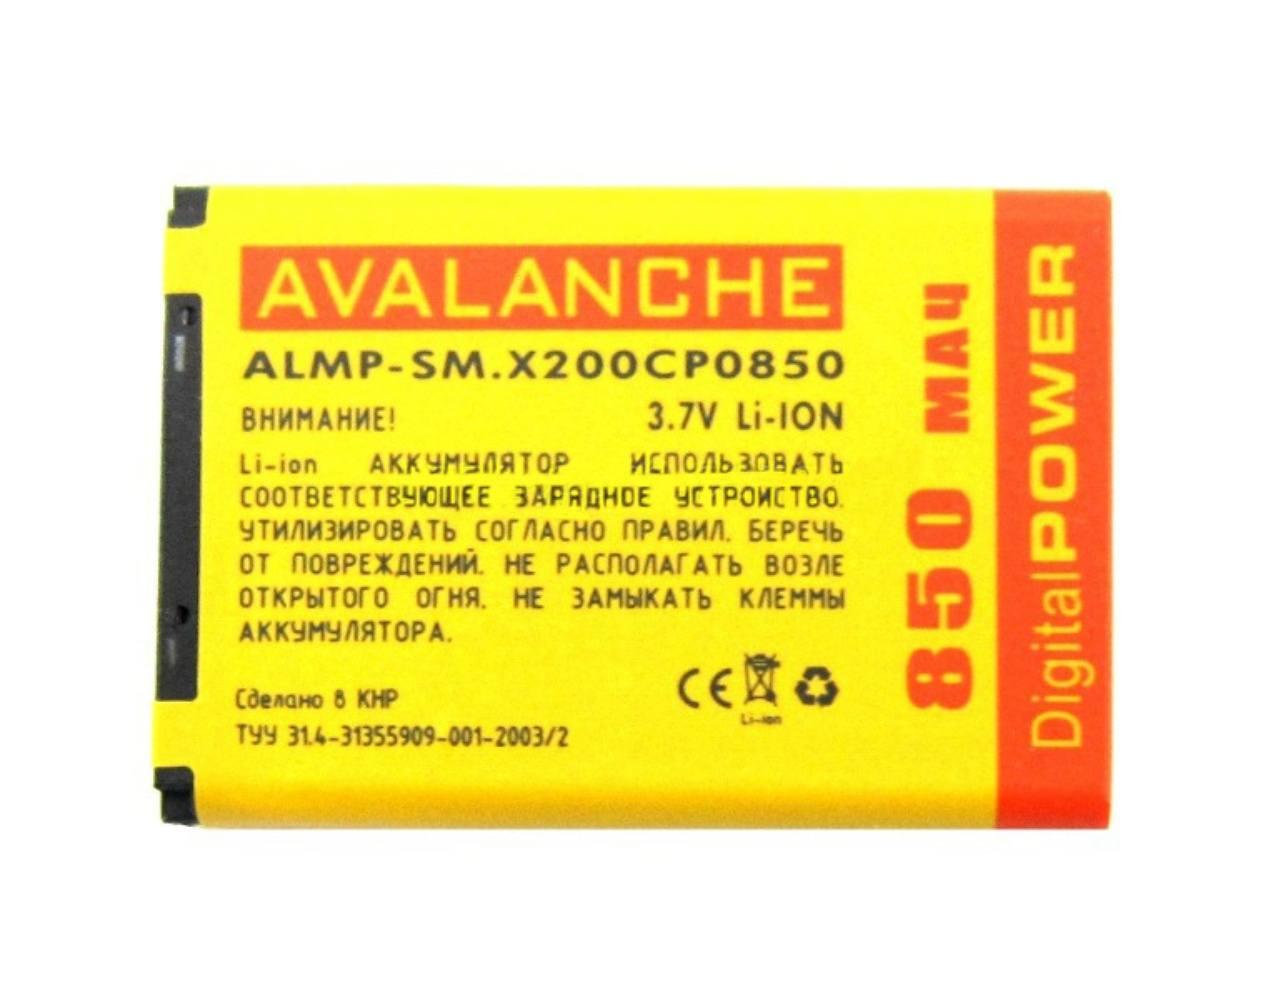 АКБ Samsung X200/M620/D520/E900/E210/E2530 850 мАч Avalanche Prem